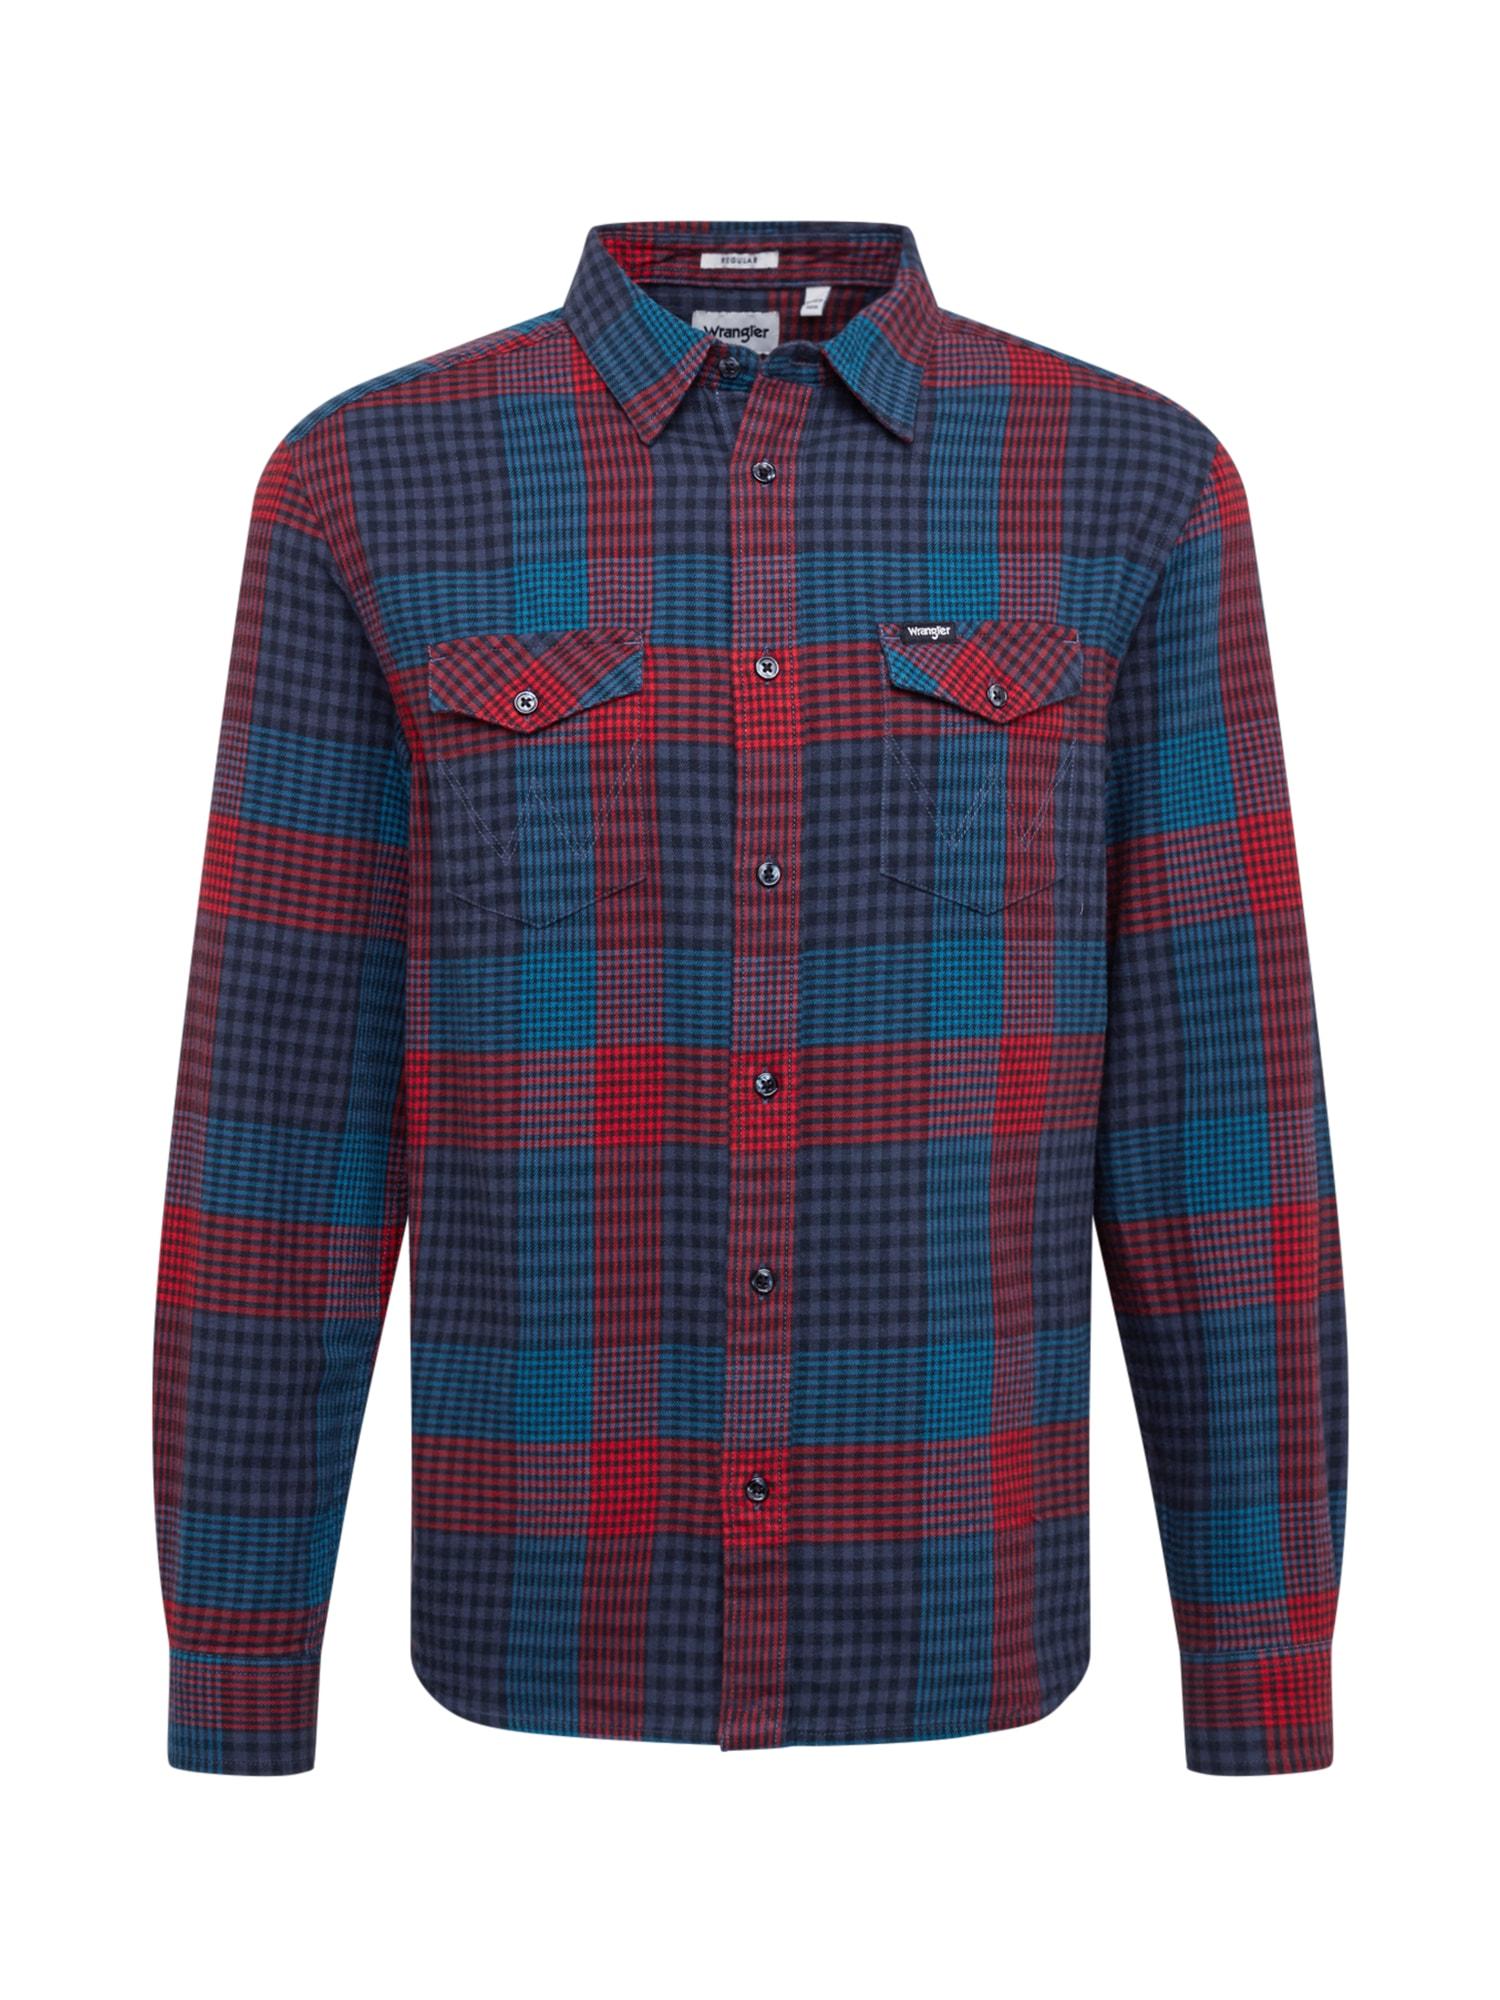 WRANGLER Marškiniai mėlyna / vyno raudona spalva